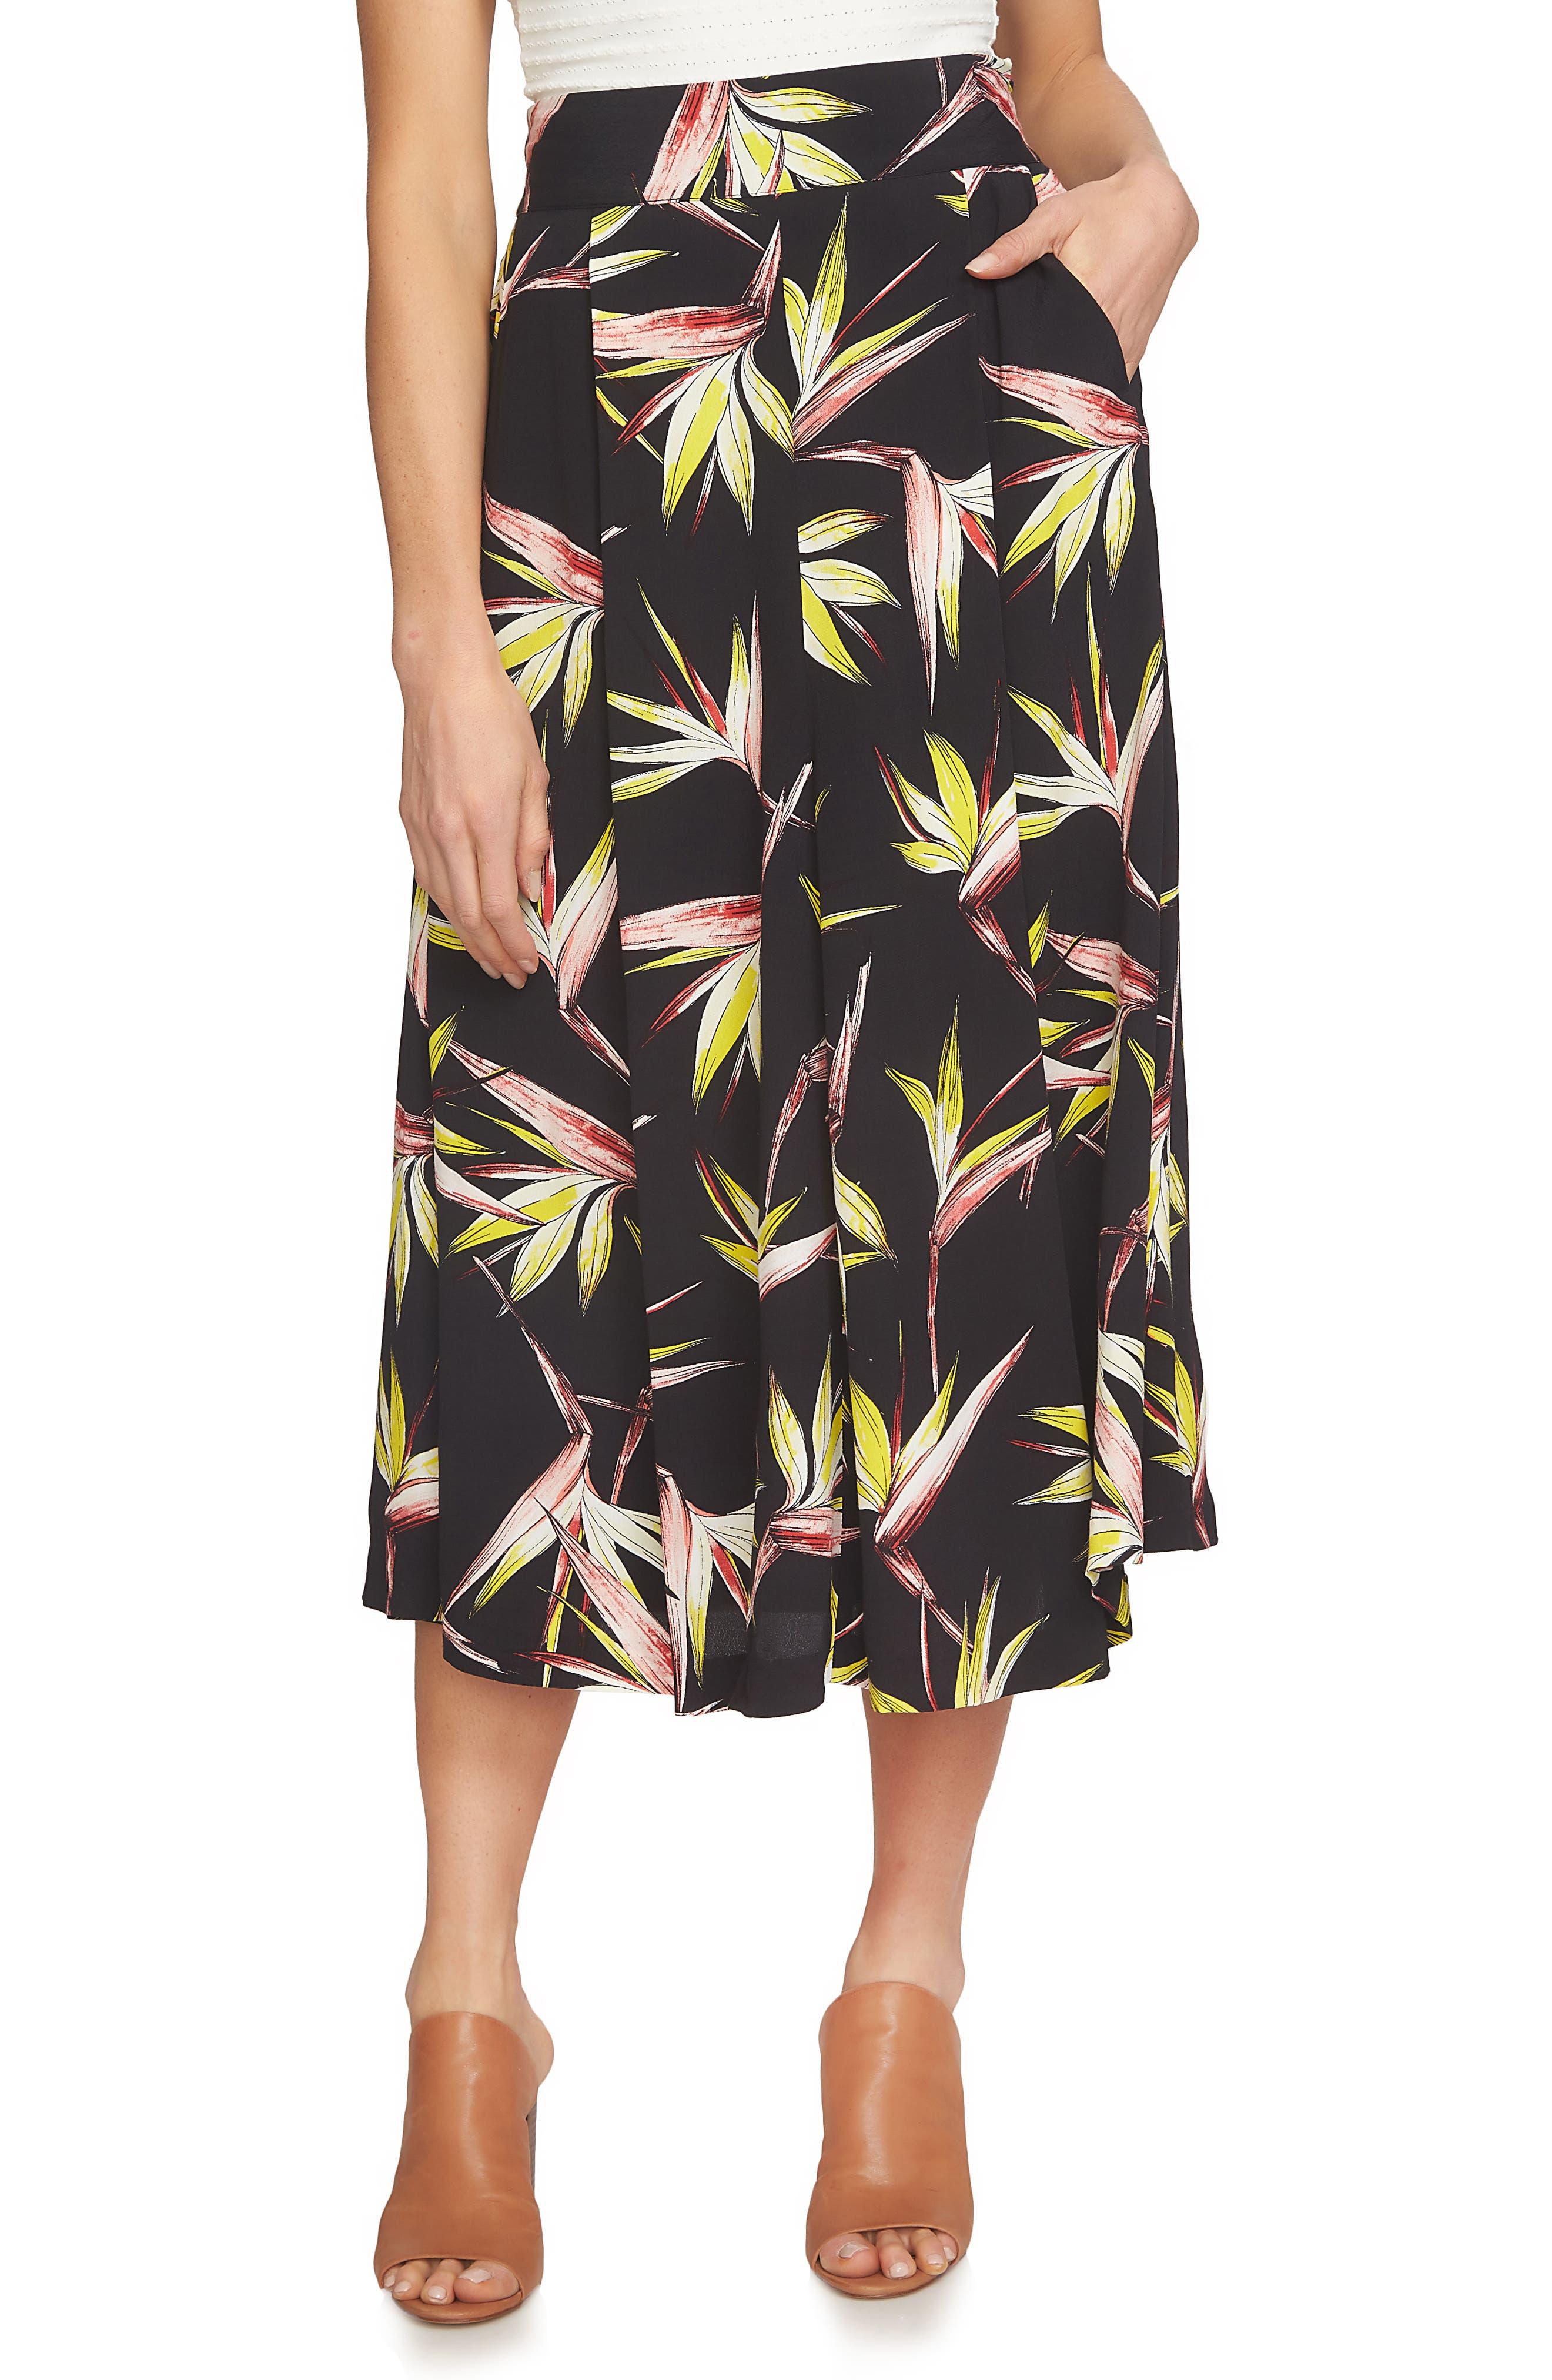 Alternate Image 1 Selected - 1.STATE High Waist Midi Skirt